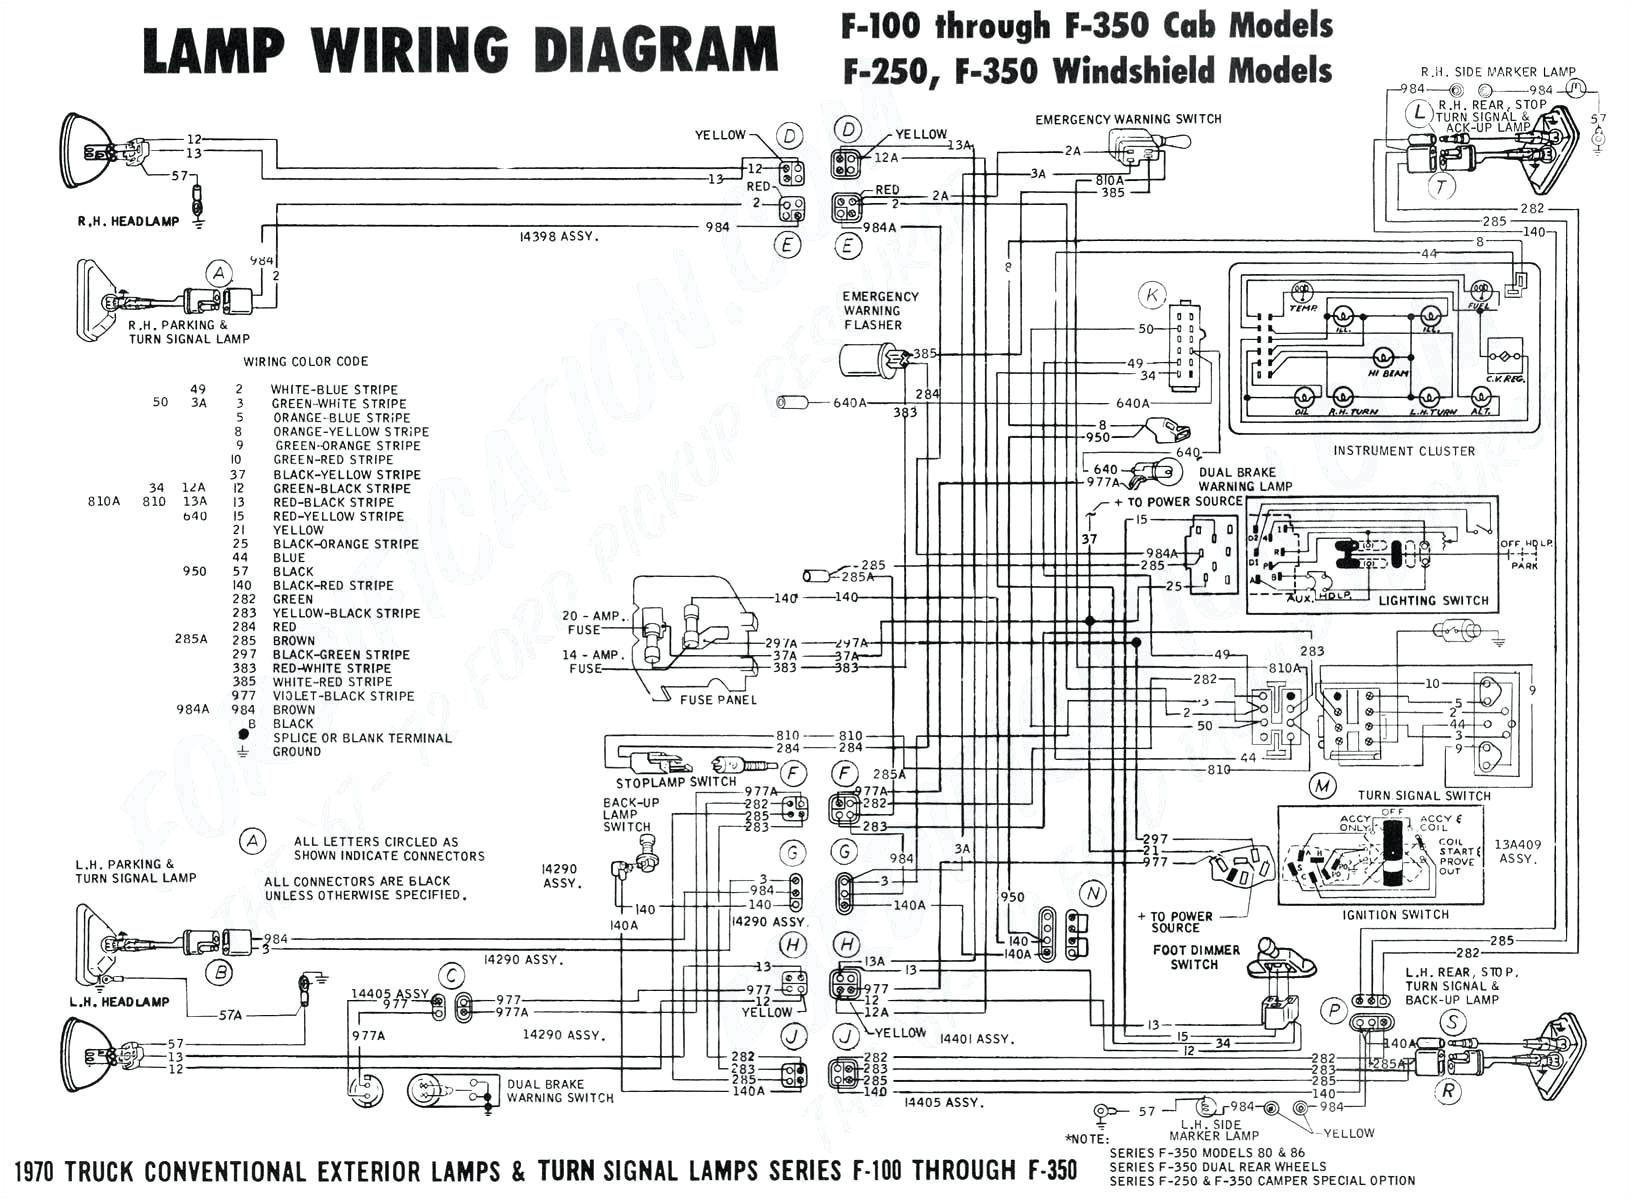 1997 polaris 250 trail boss wiring diagram fuse wiring diagram technic massey 250 wiring diagram mf 35